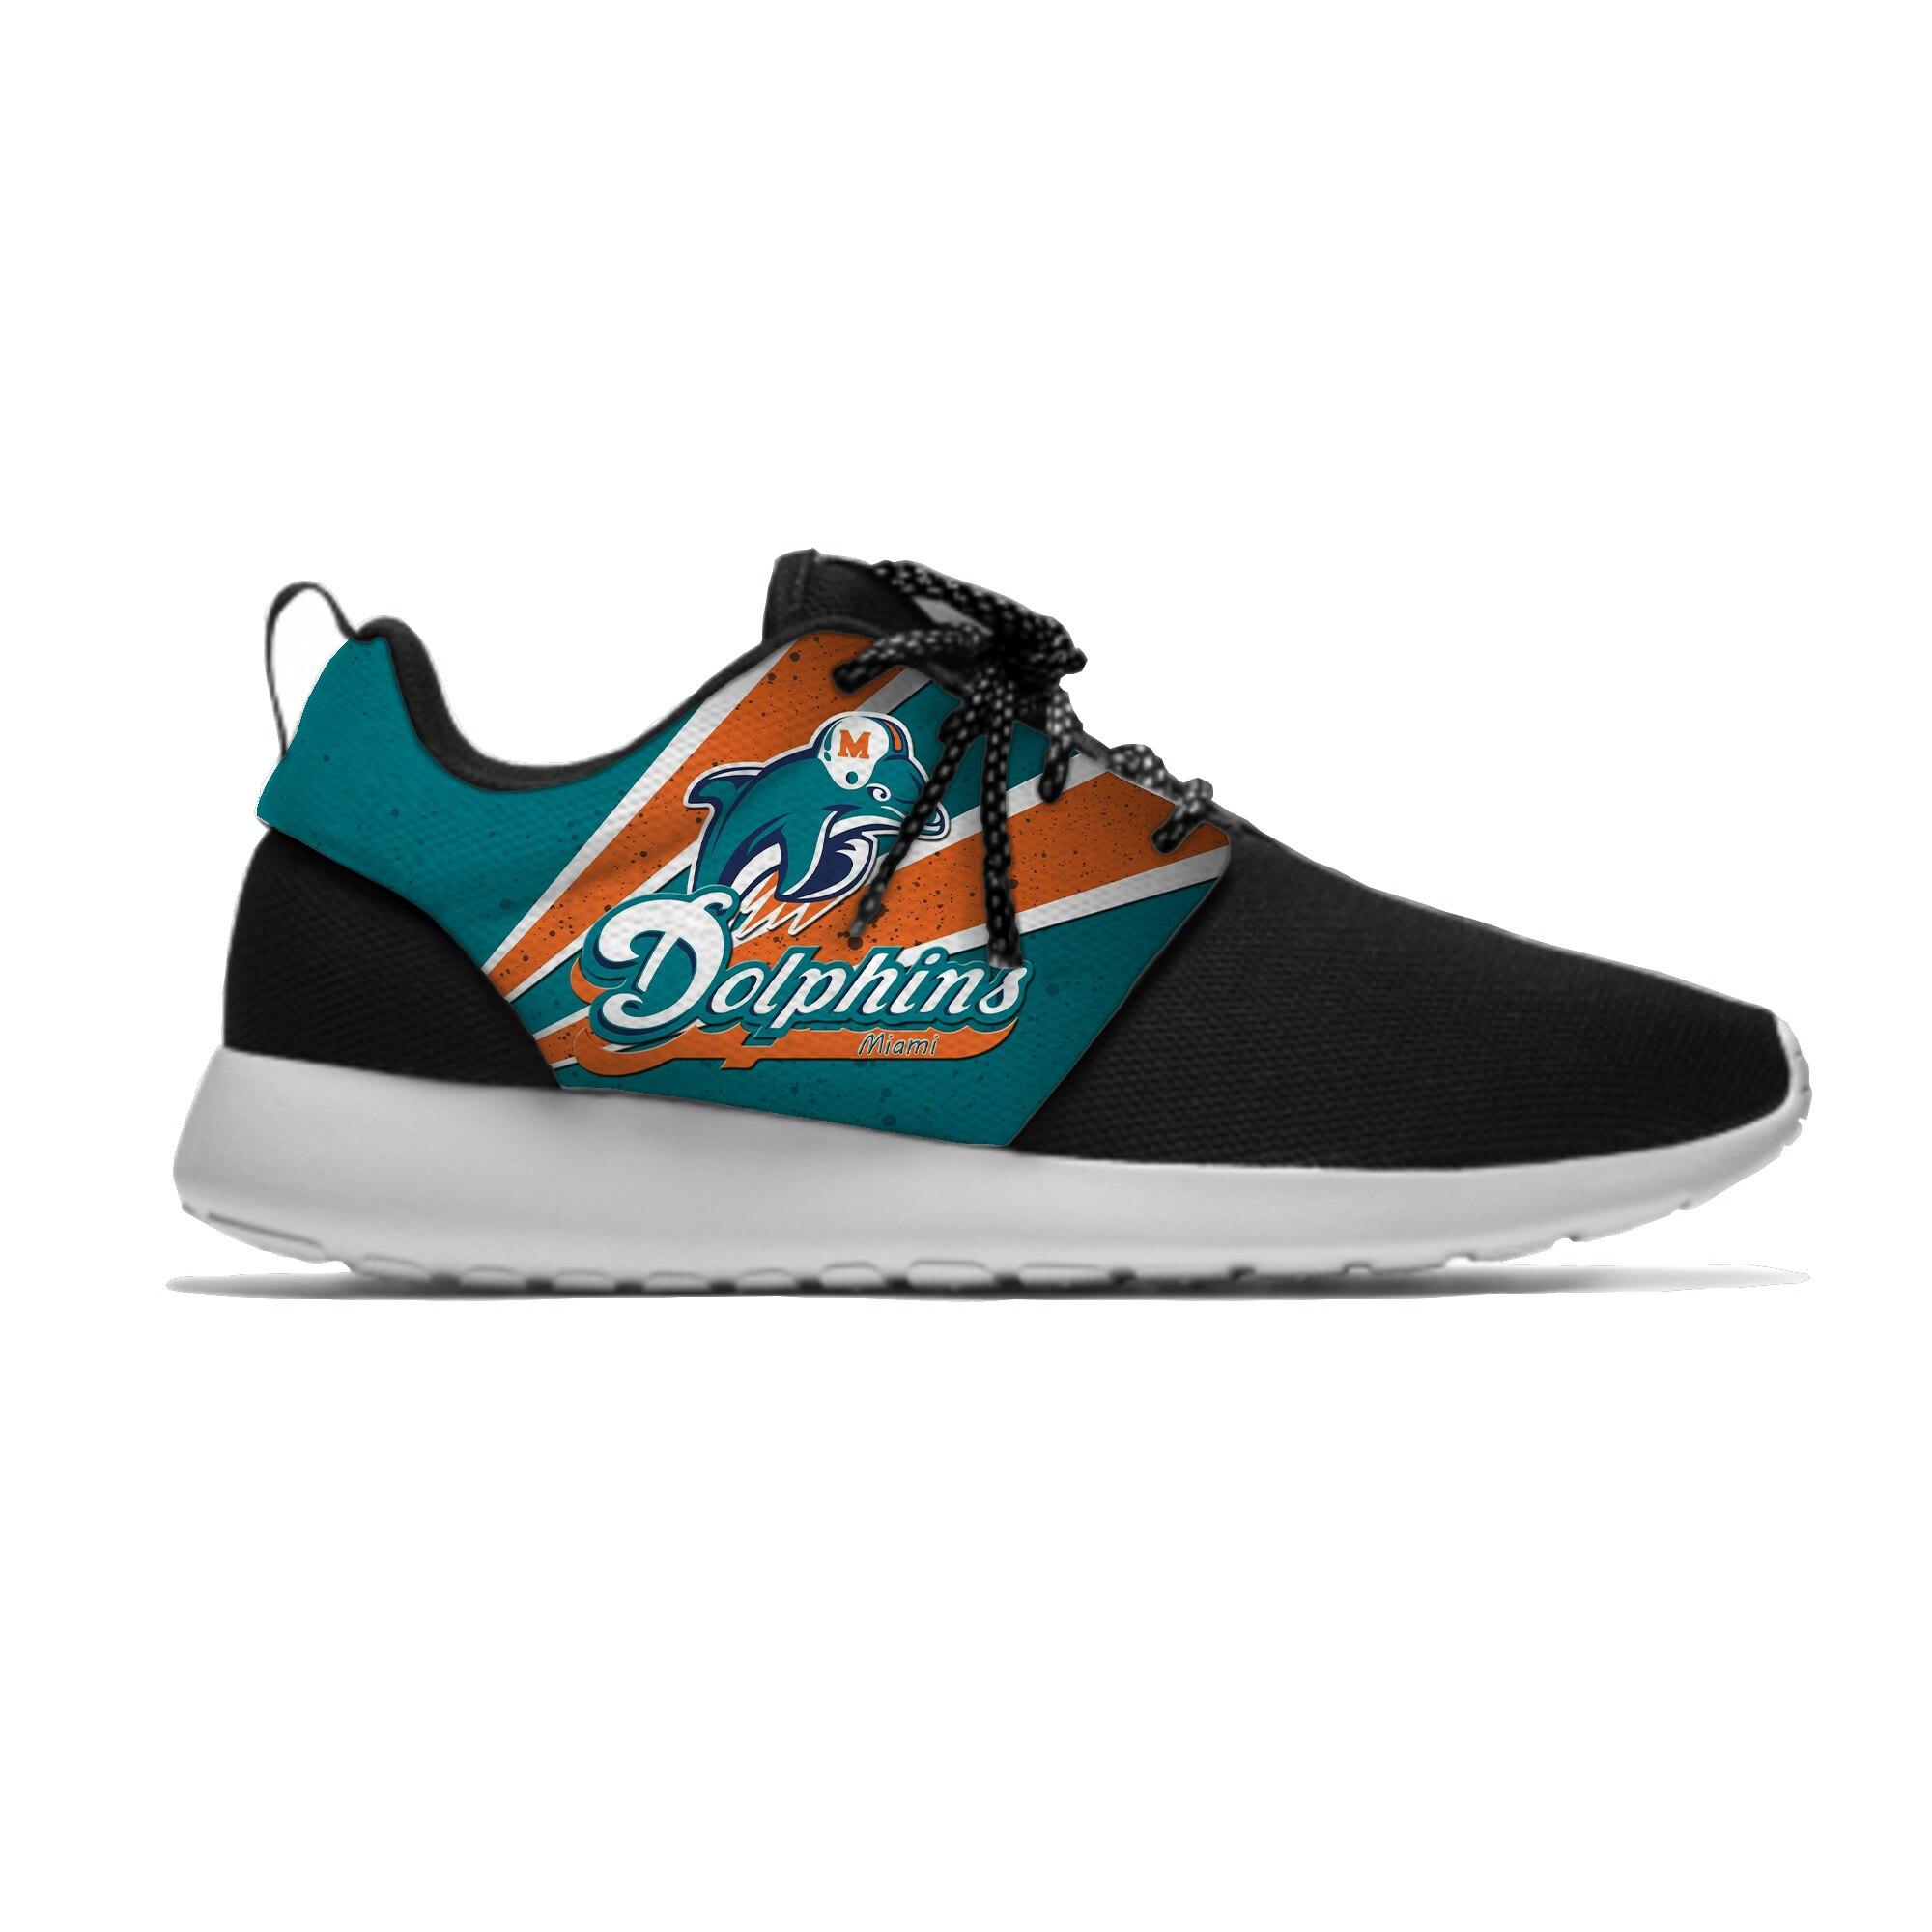 Football Team Dolphins Yeezy Sneaker Running Shoe for Women and Men